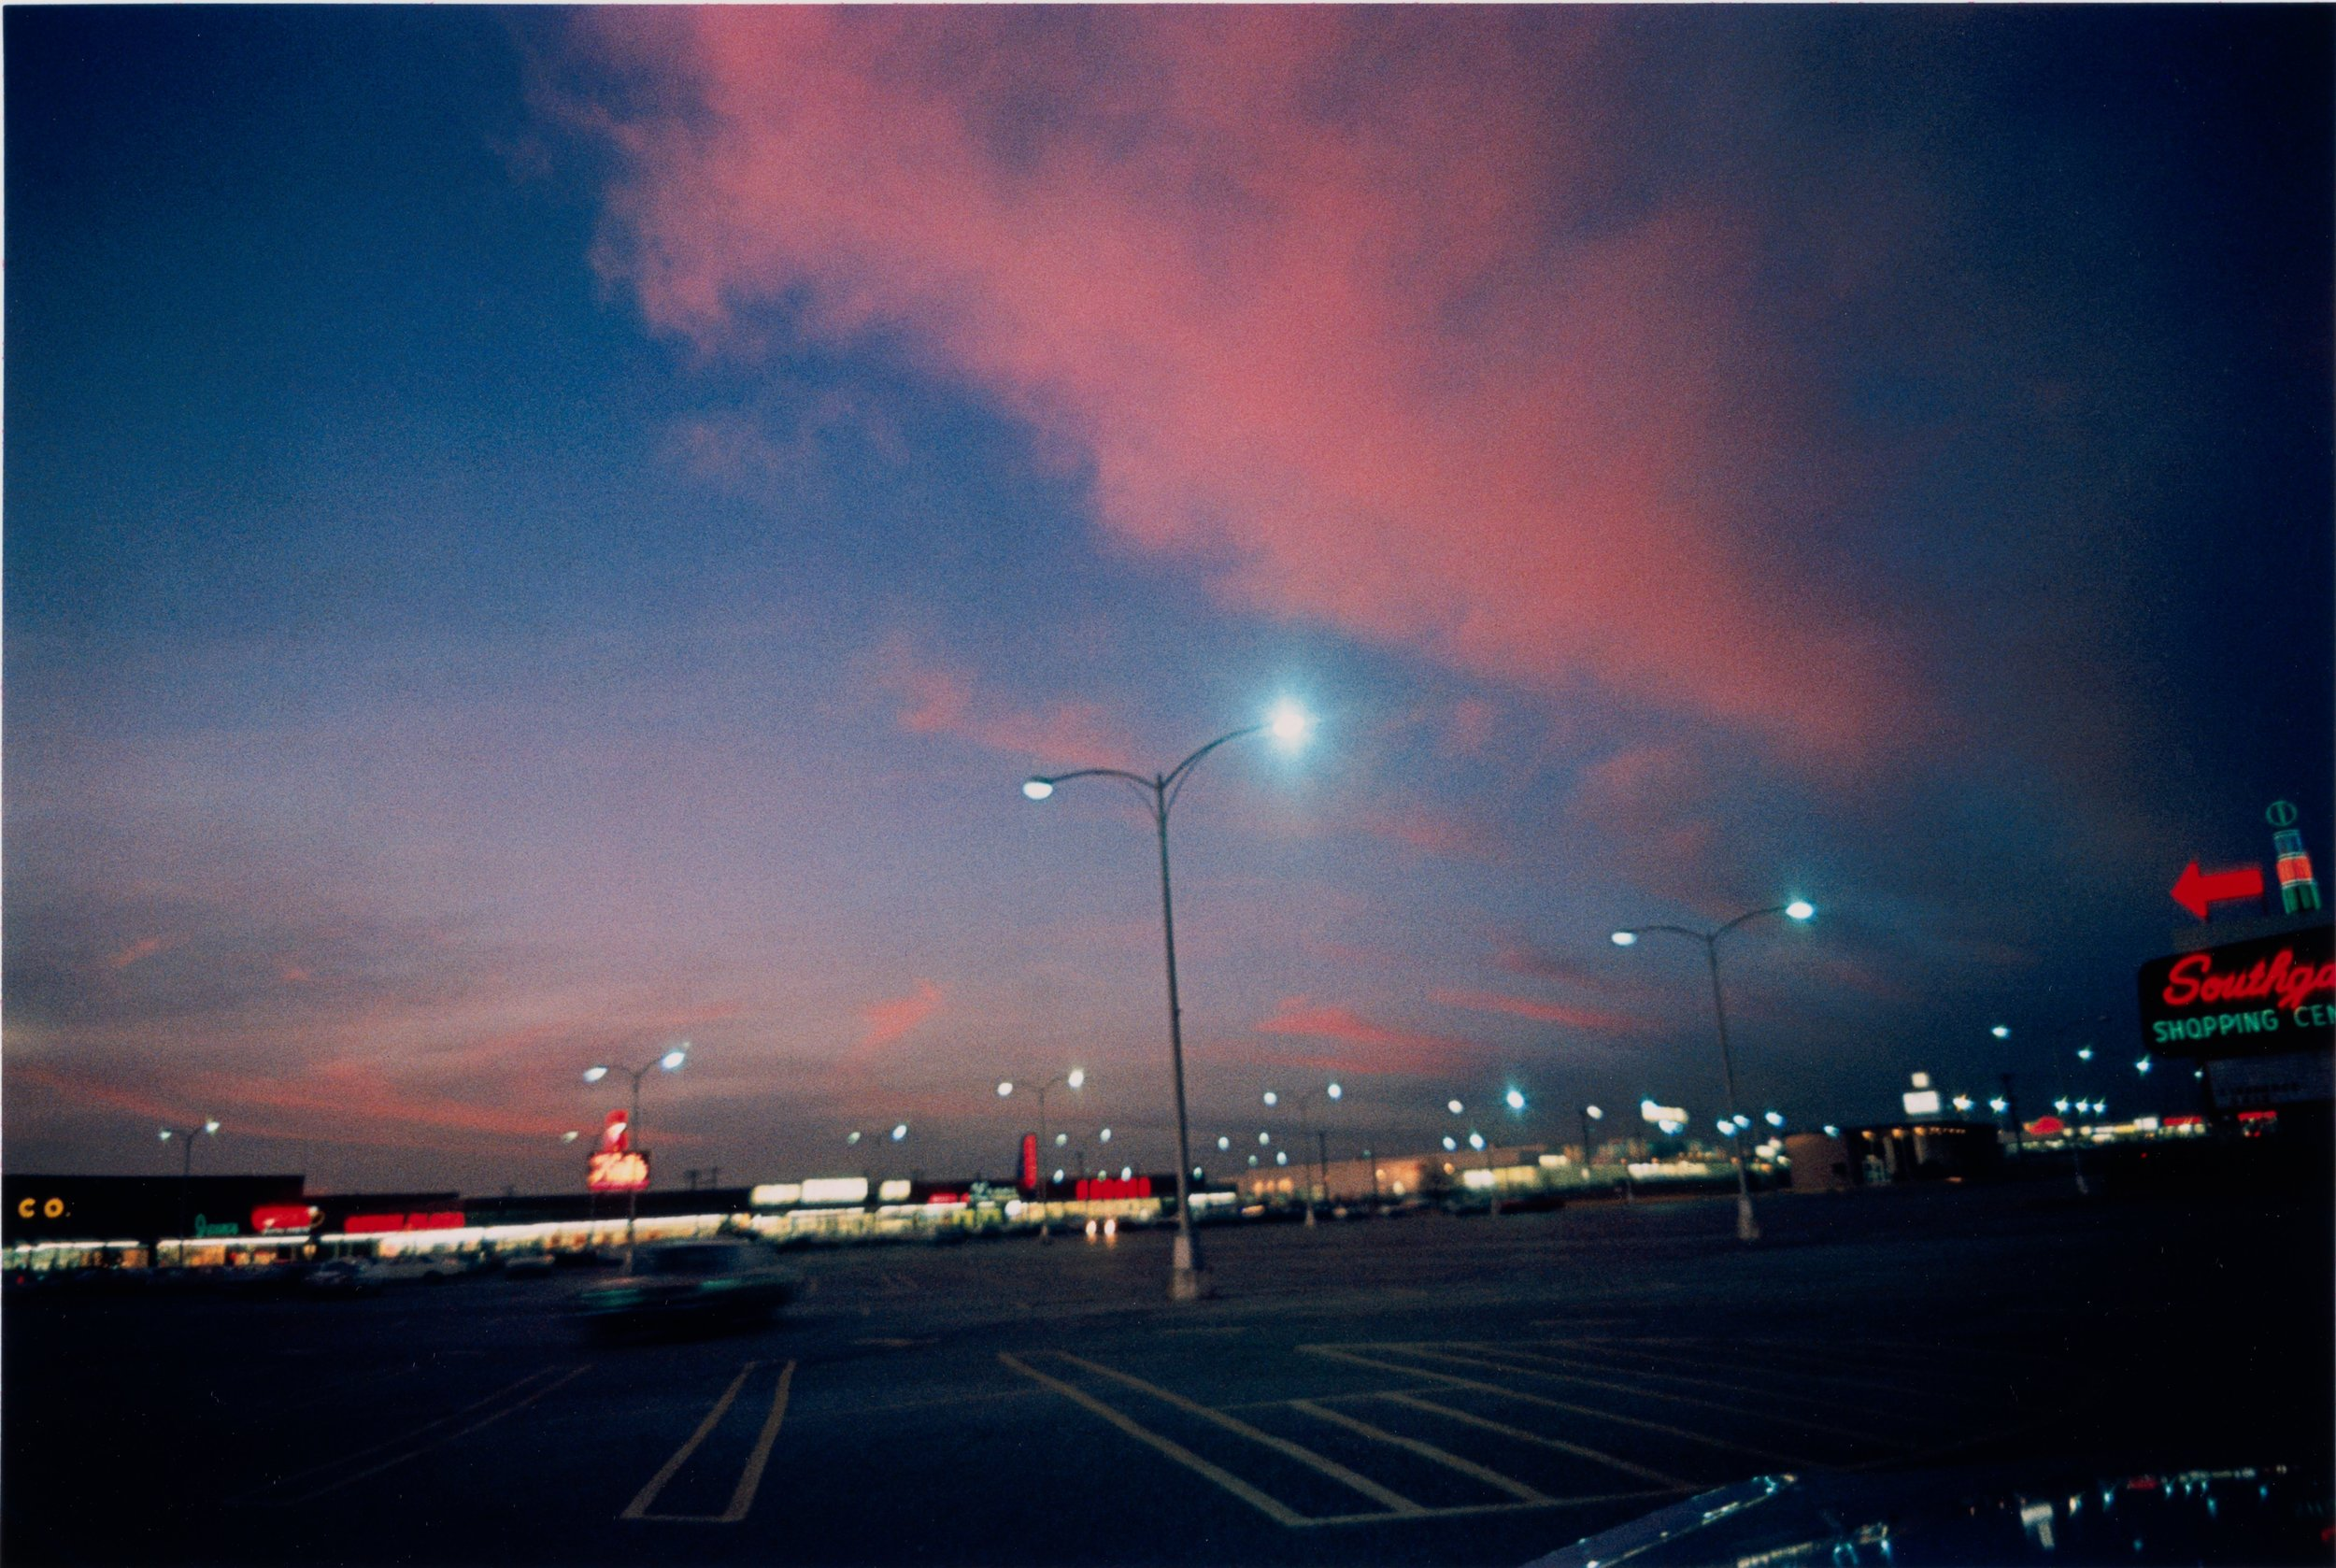 William Eggleston,  Arkansas, ca. 1965-68, Dye-transfer print, The Metropolitan Museum of Art, New York, Promised Gift of Jade Lau © Eggleston Artistic Trust. Courtesy David Zwirner, New York/London/Hong Kong